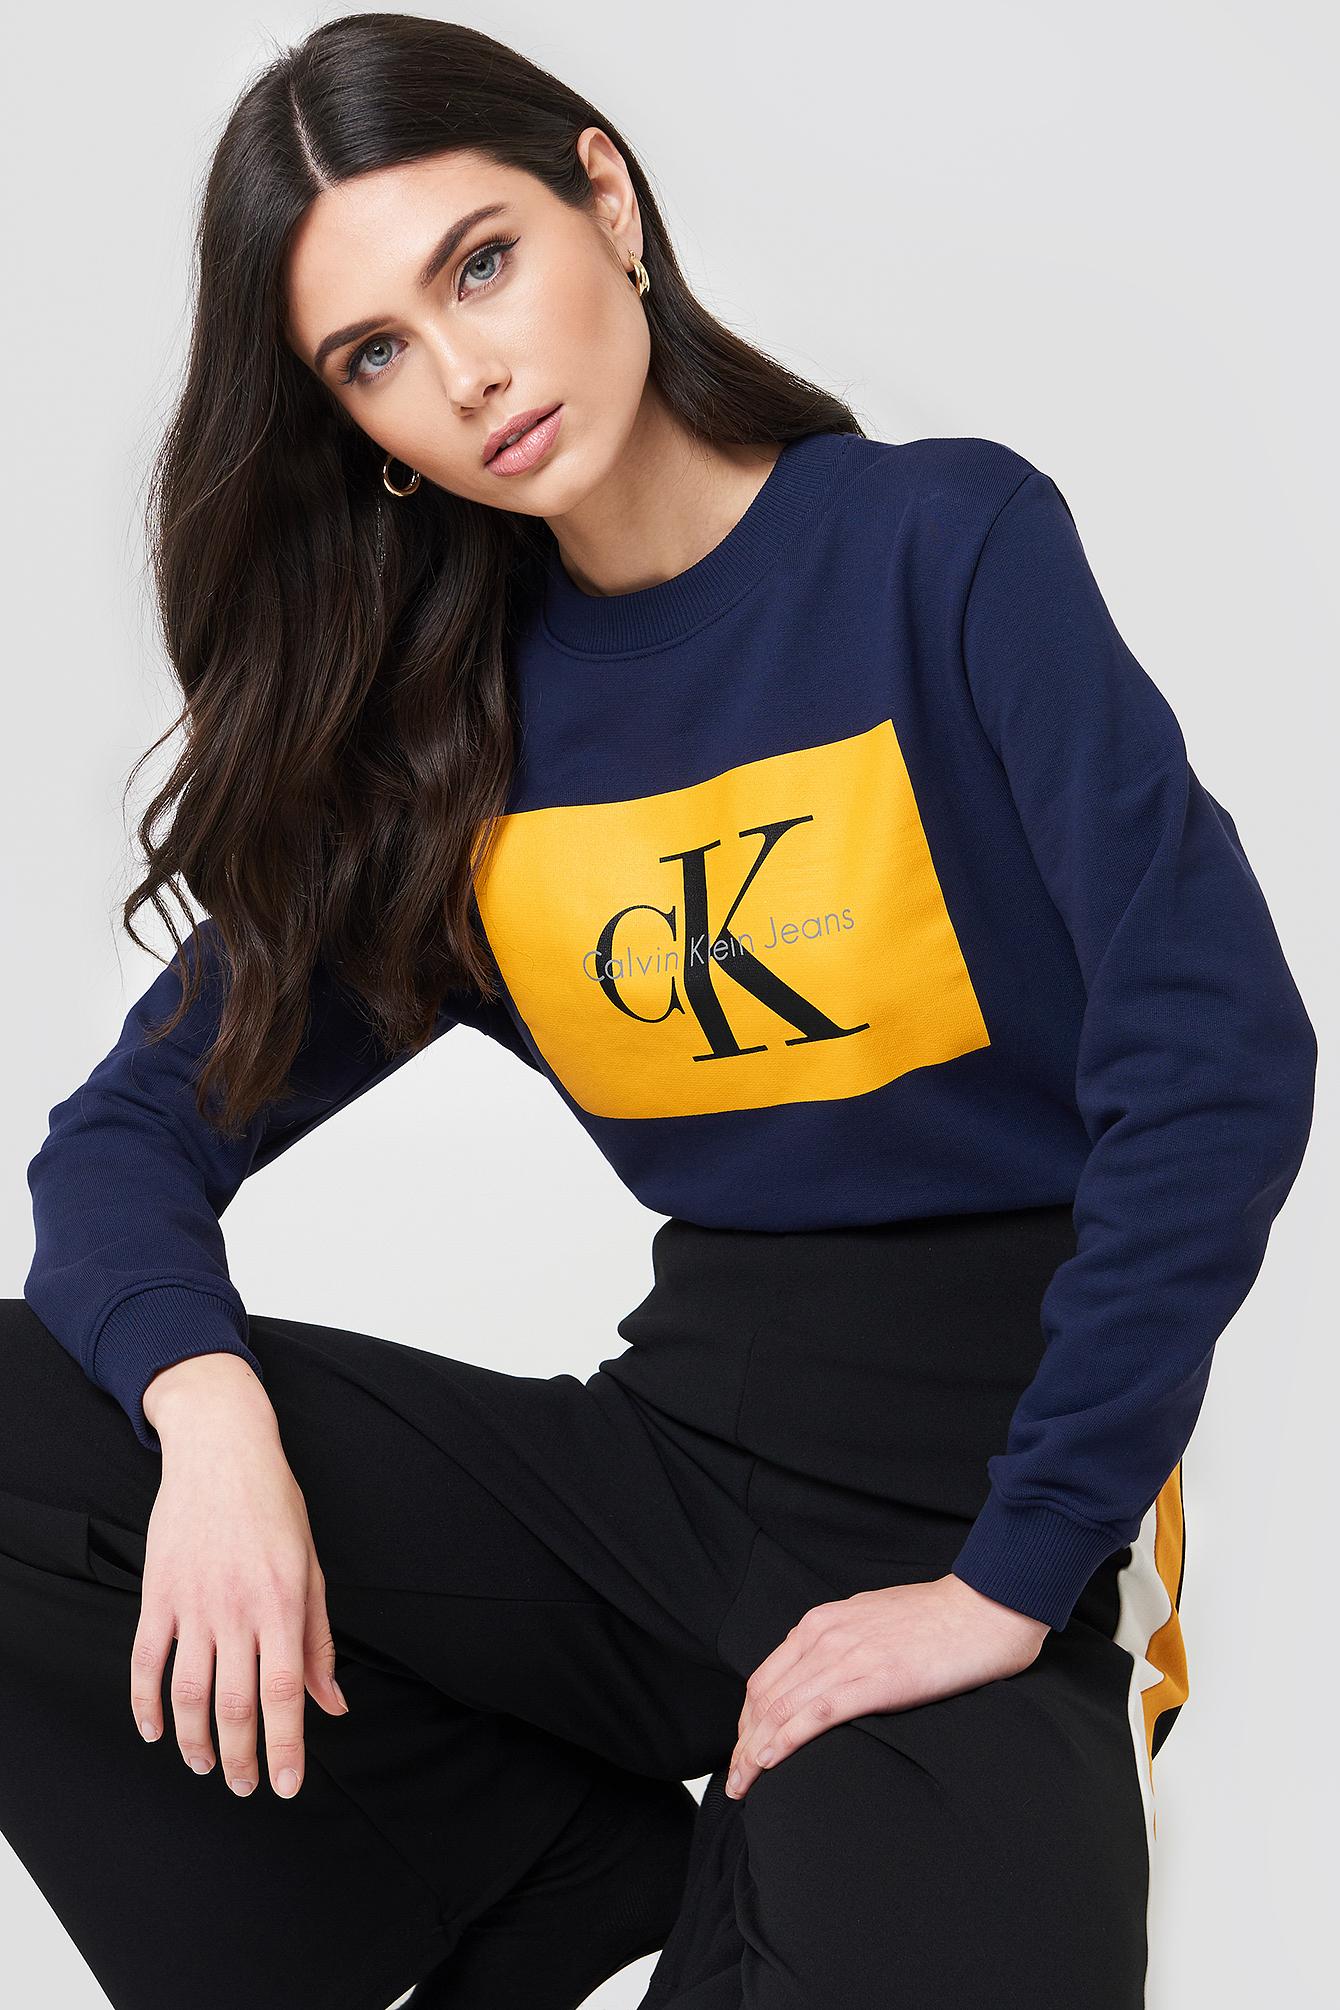 combien Magasin De Dédouanement Calvin Klein Hebe True Icon Sweater En Vente En Ligne 1SmsILtgy